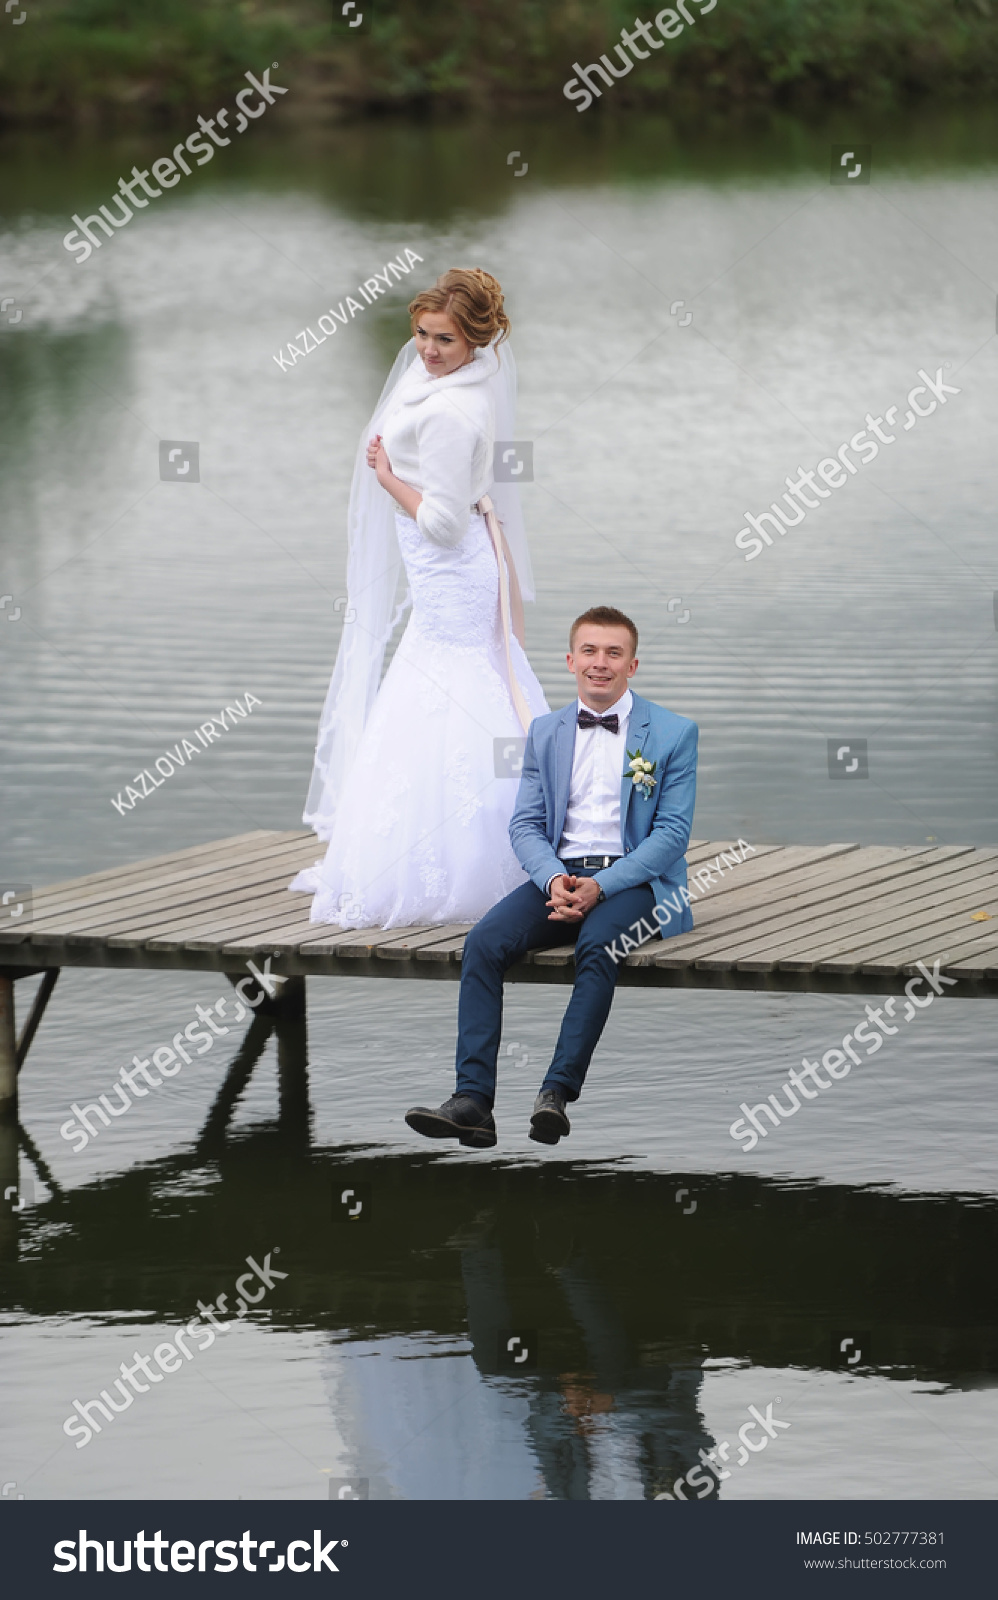 f829797f9c2970 Beautiful Young Wedding Couple Bride Groom Stock Photo (Edit Now ...